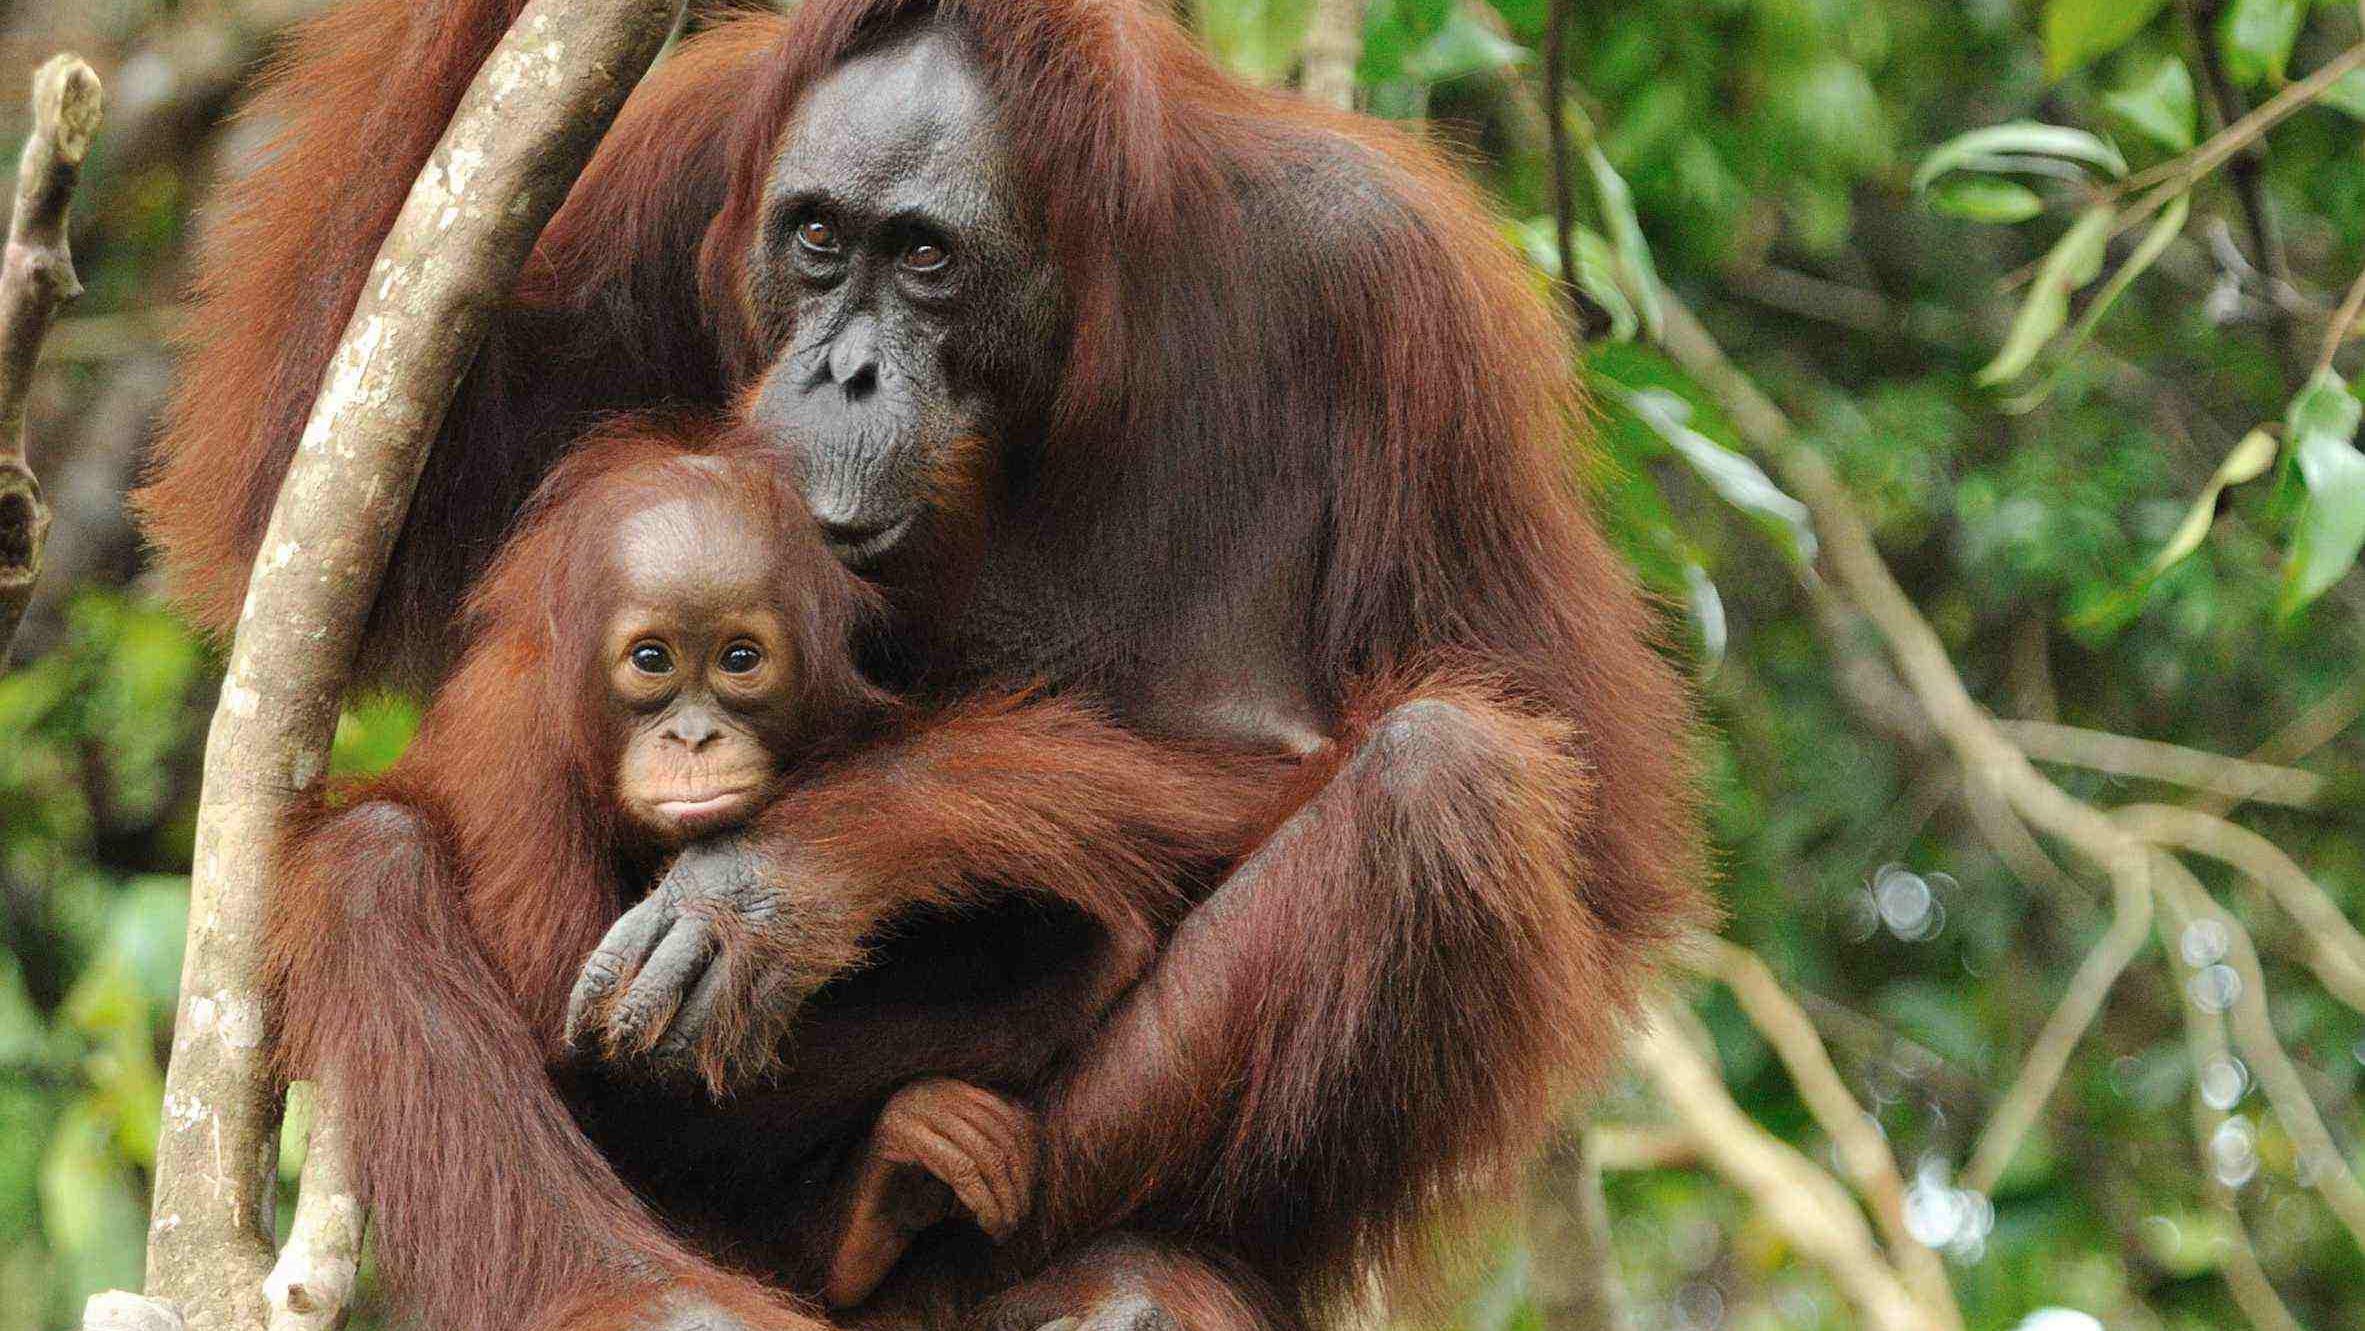 orangutans, coad leopard, proboscis monkeys, spiders, snakes, monkey, forest, jungle, whale shark, sun bear, birds, lizards